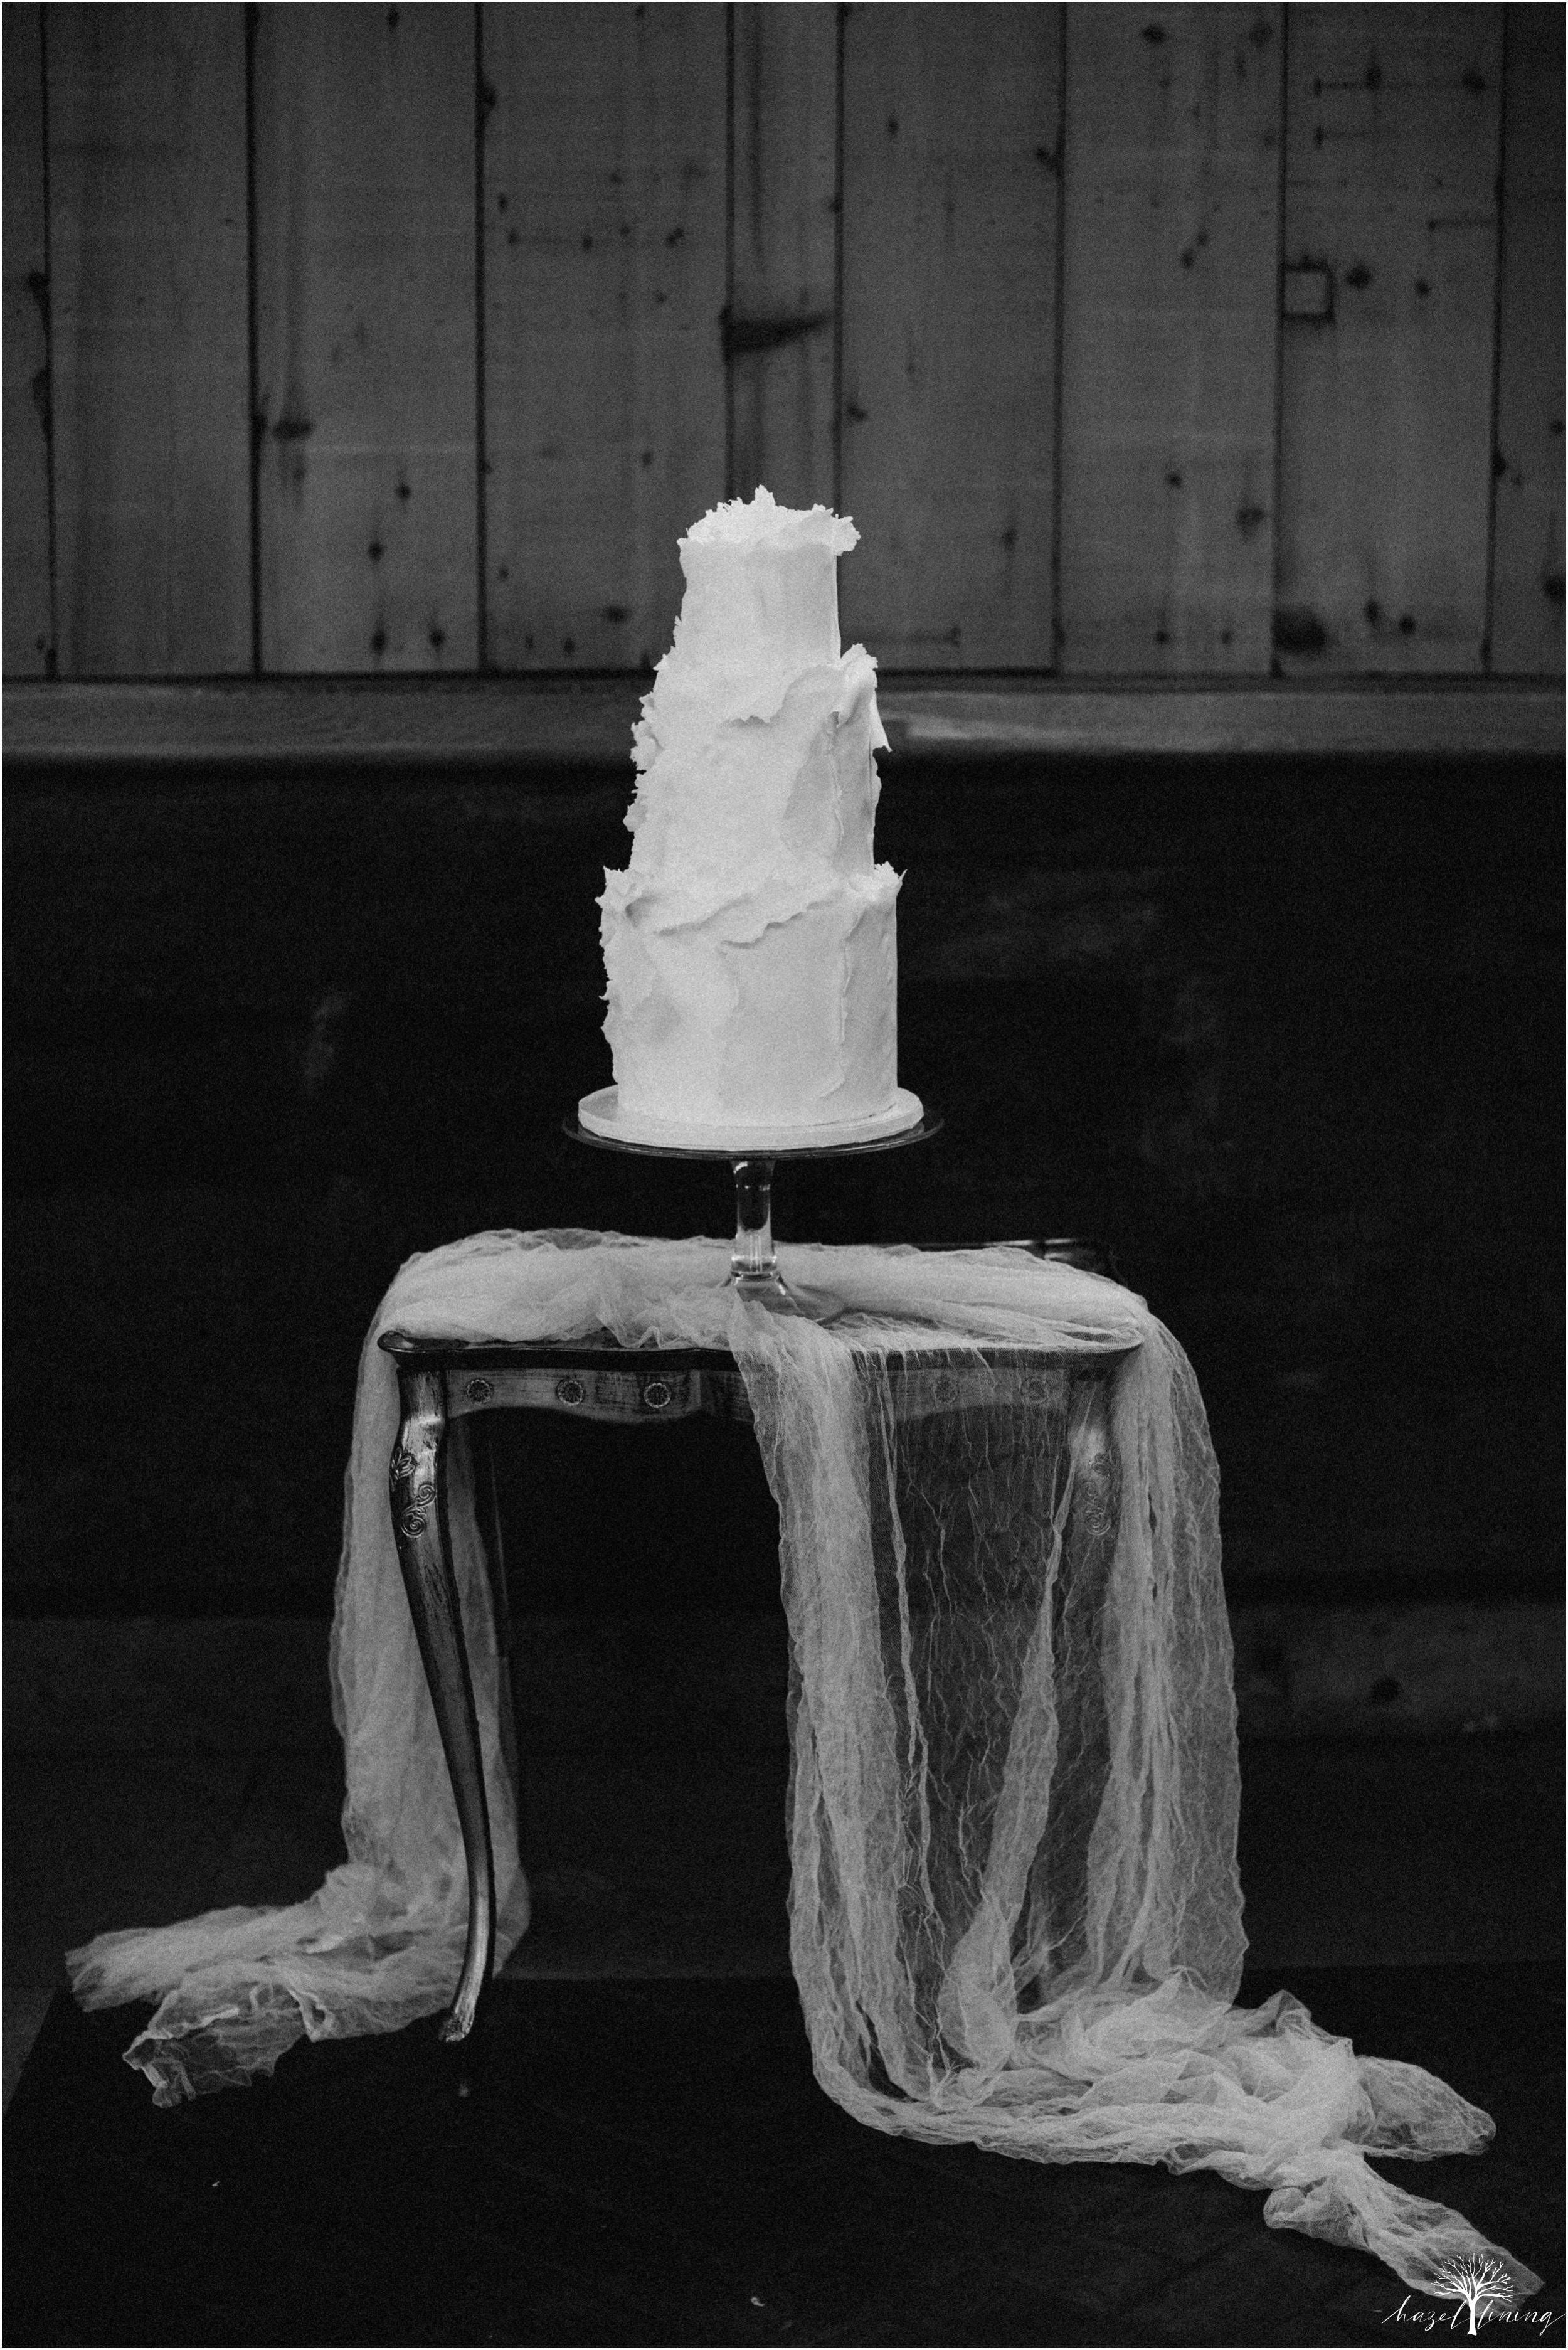 carl-chloe-the-ryland-inn-whitehouse-station-new-jersey-styled-squad-hazel-lining-photography-destination-elopement-wedding-engagement-photography_0010.jpg